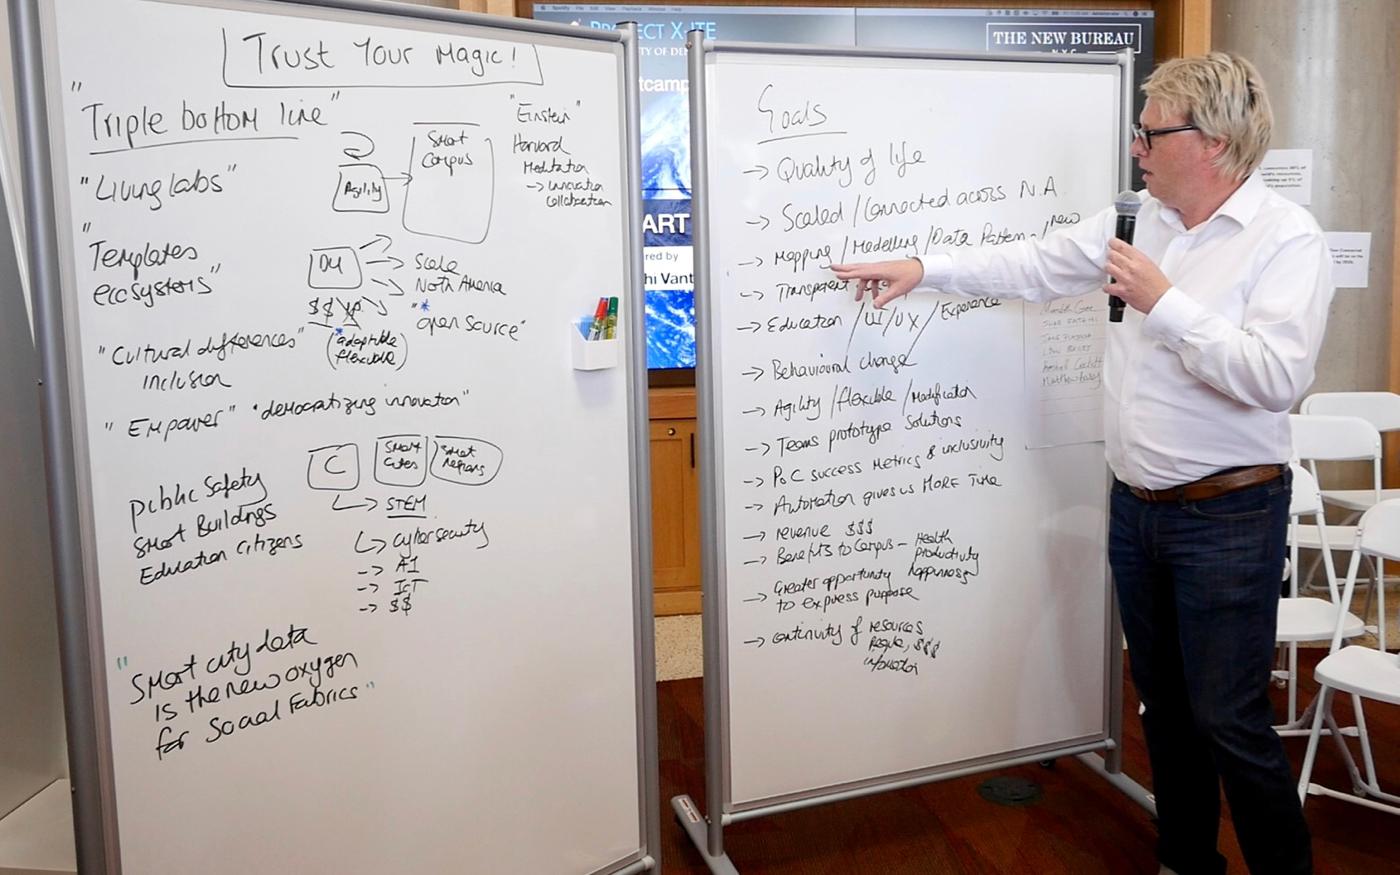 Matthew Bailey - IoT Expert from Arrow Electronics